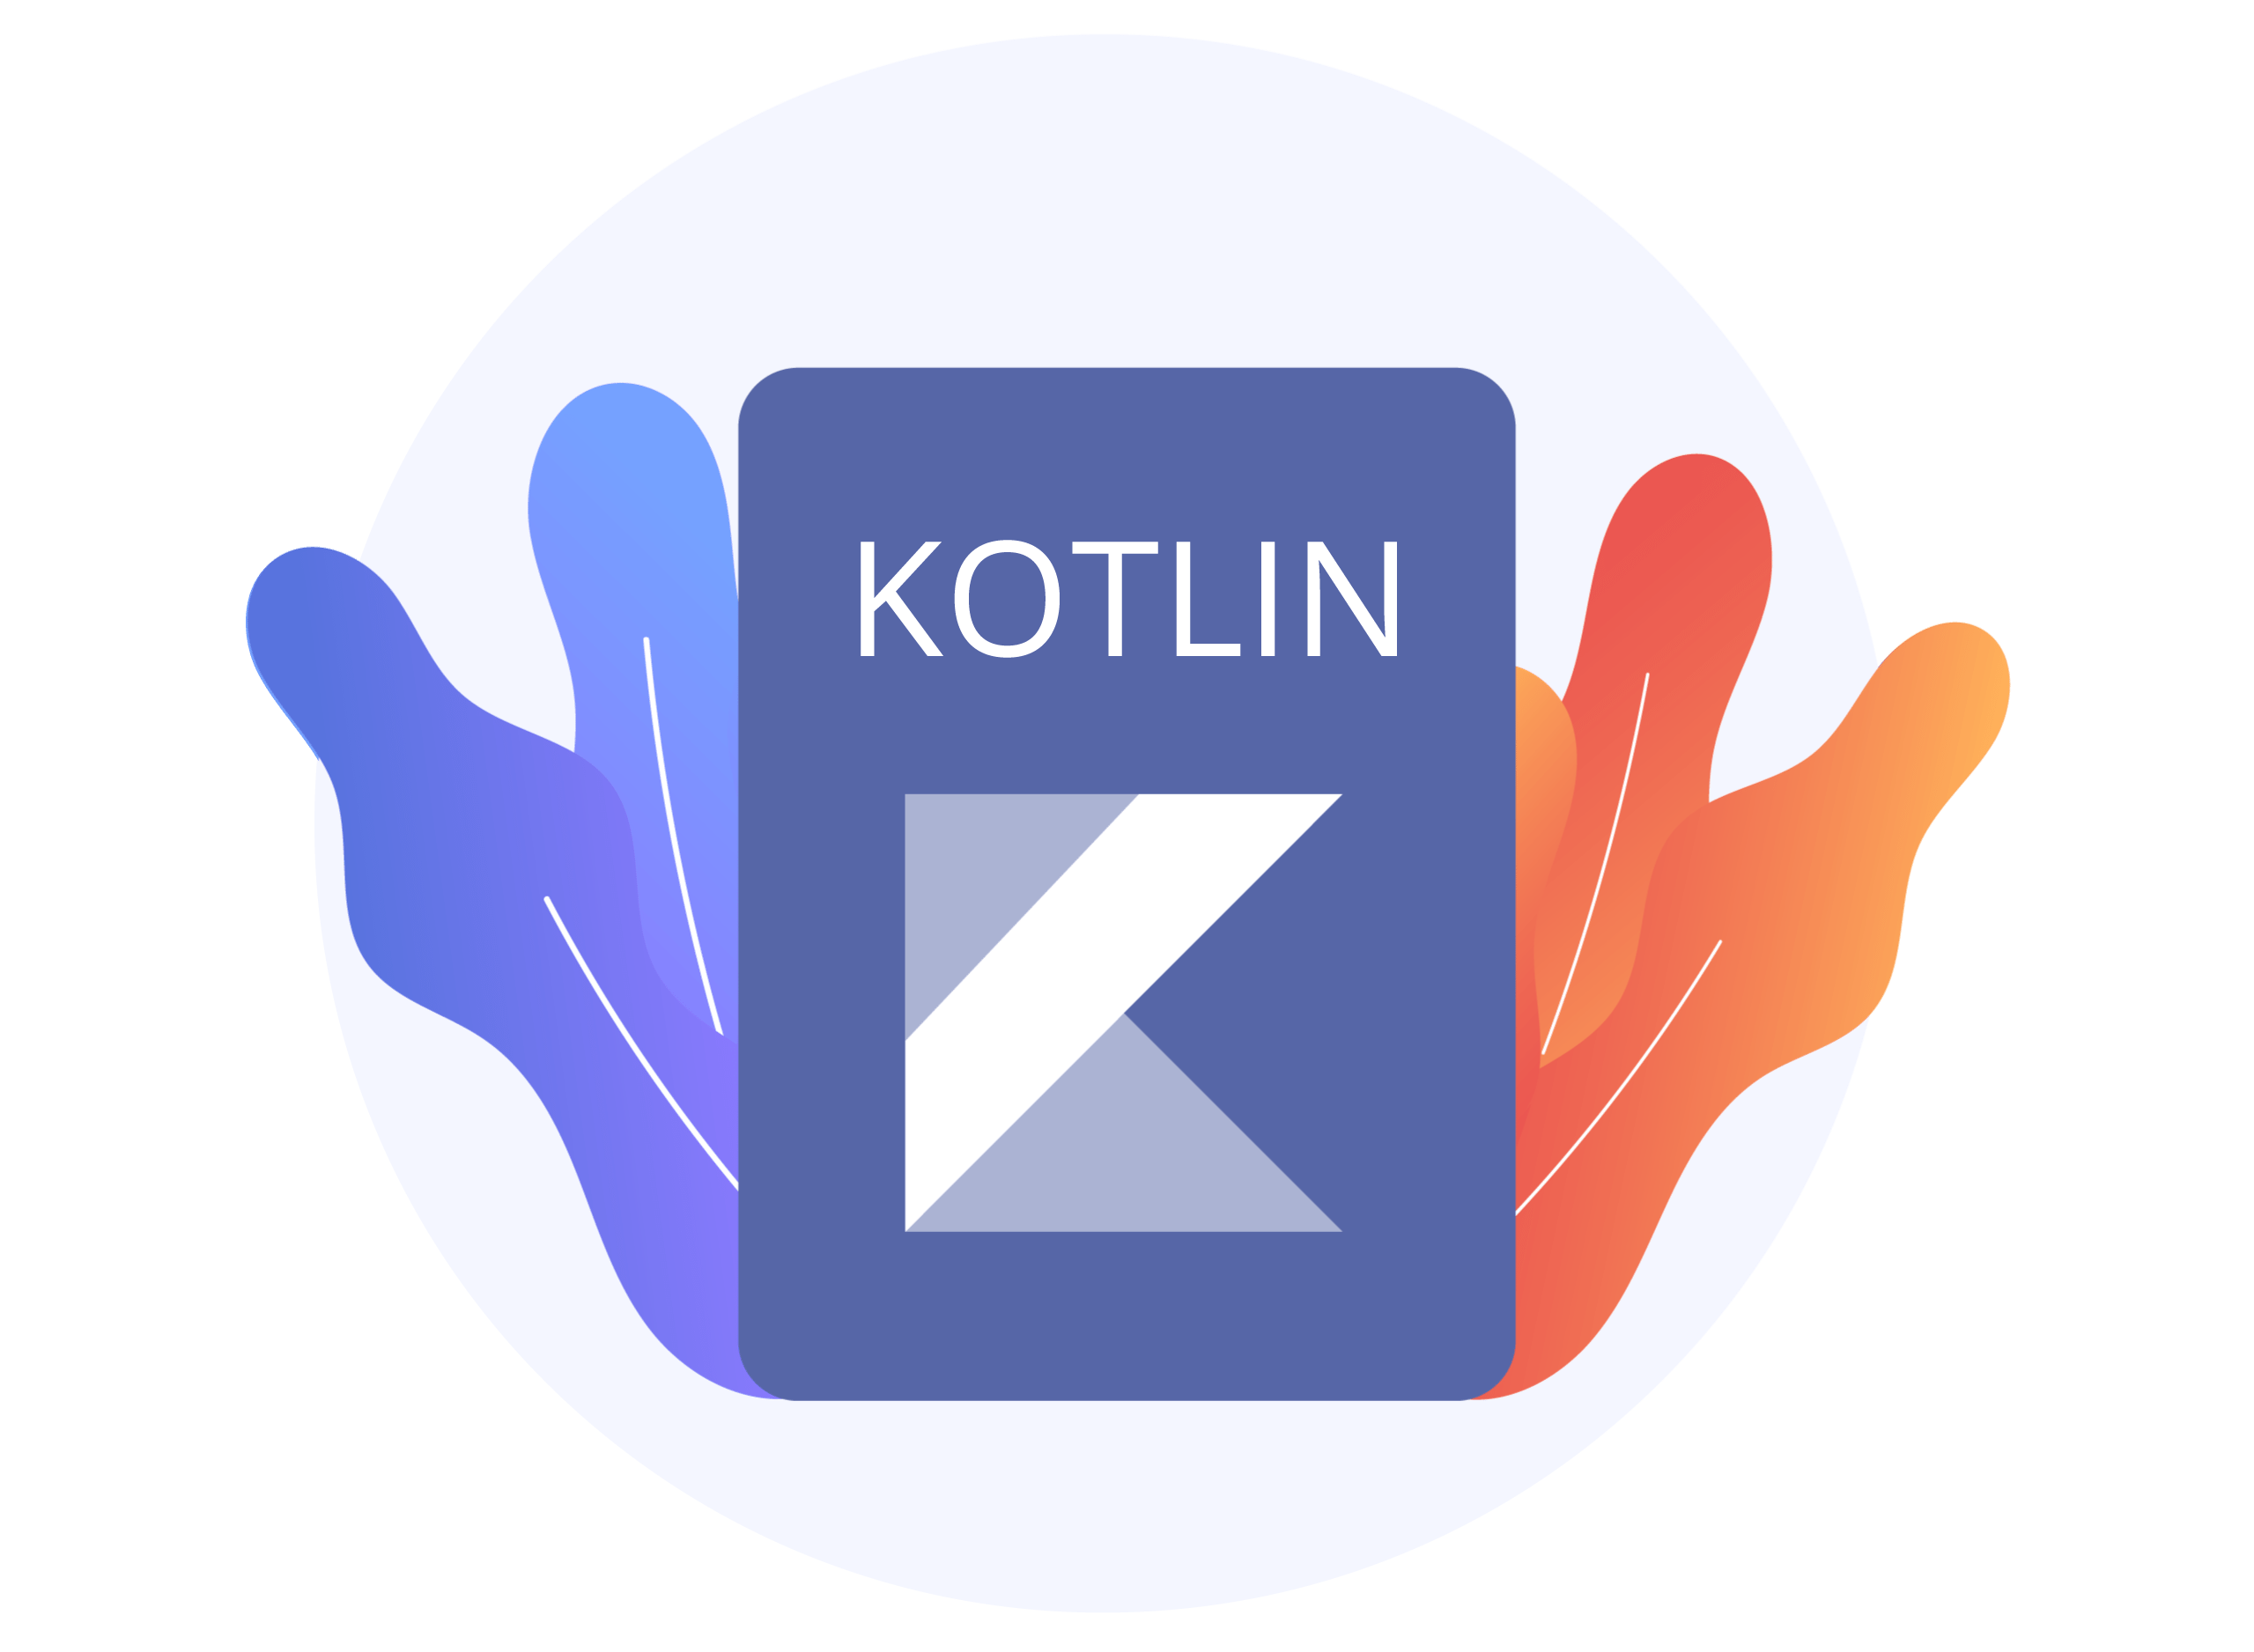 kotlin security training